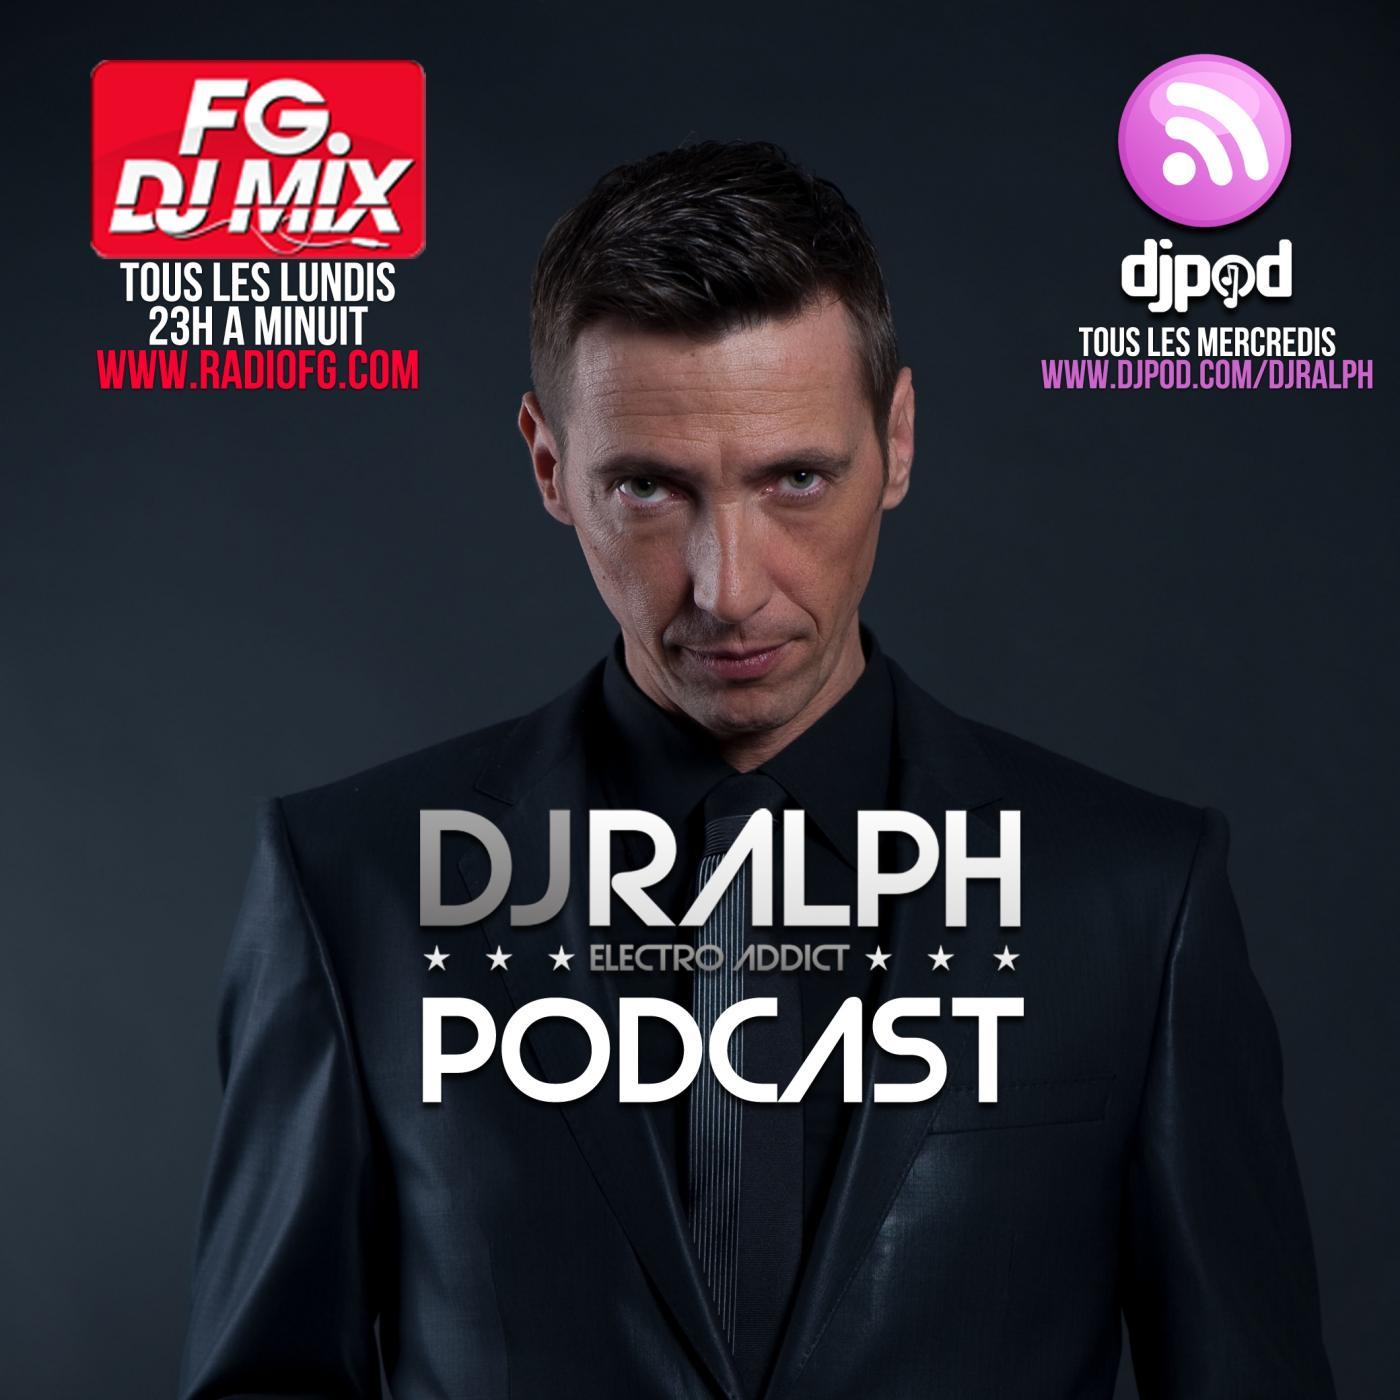 DJ Ralph Electro Addict Podcast